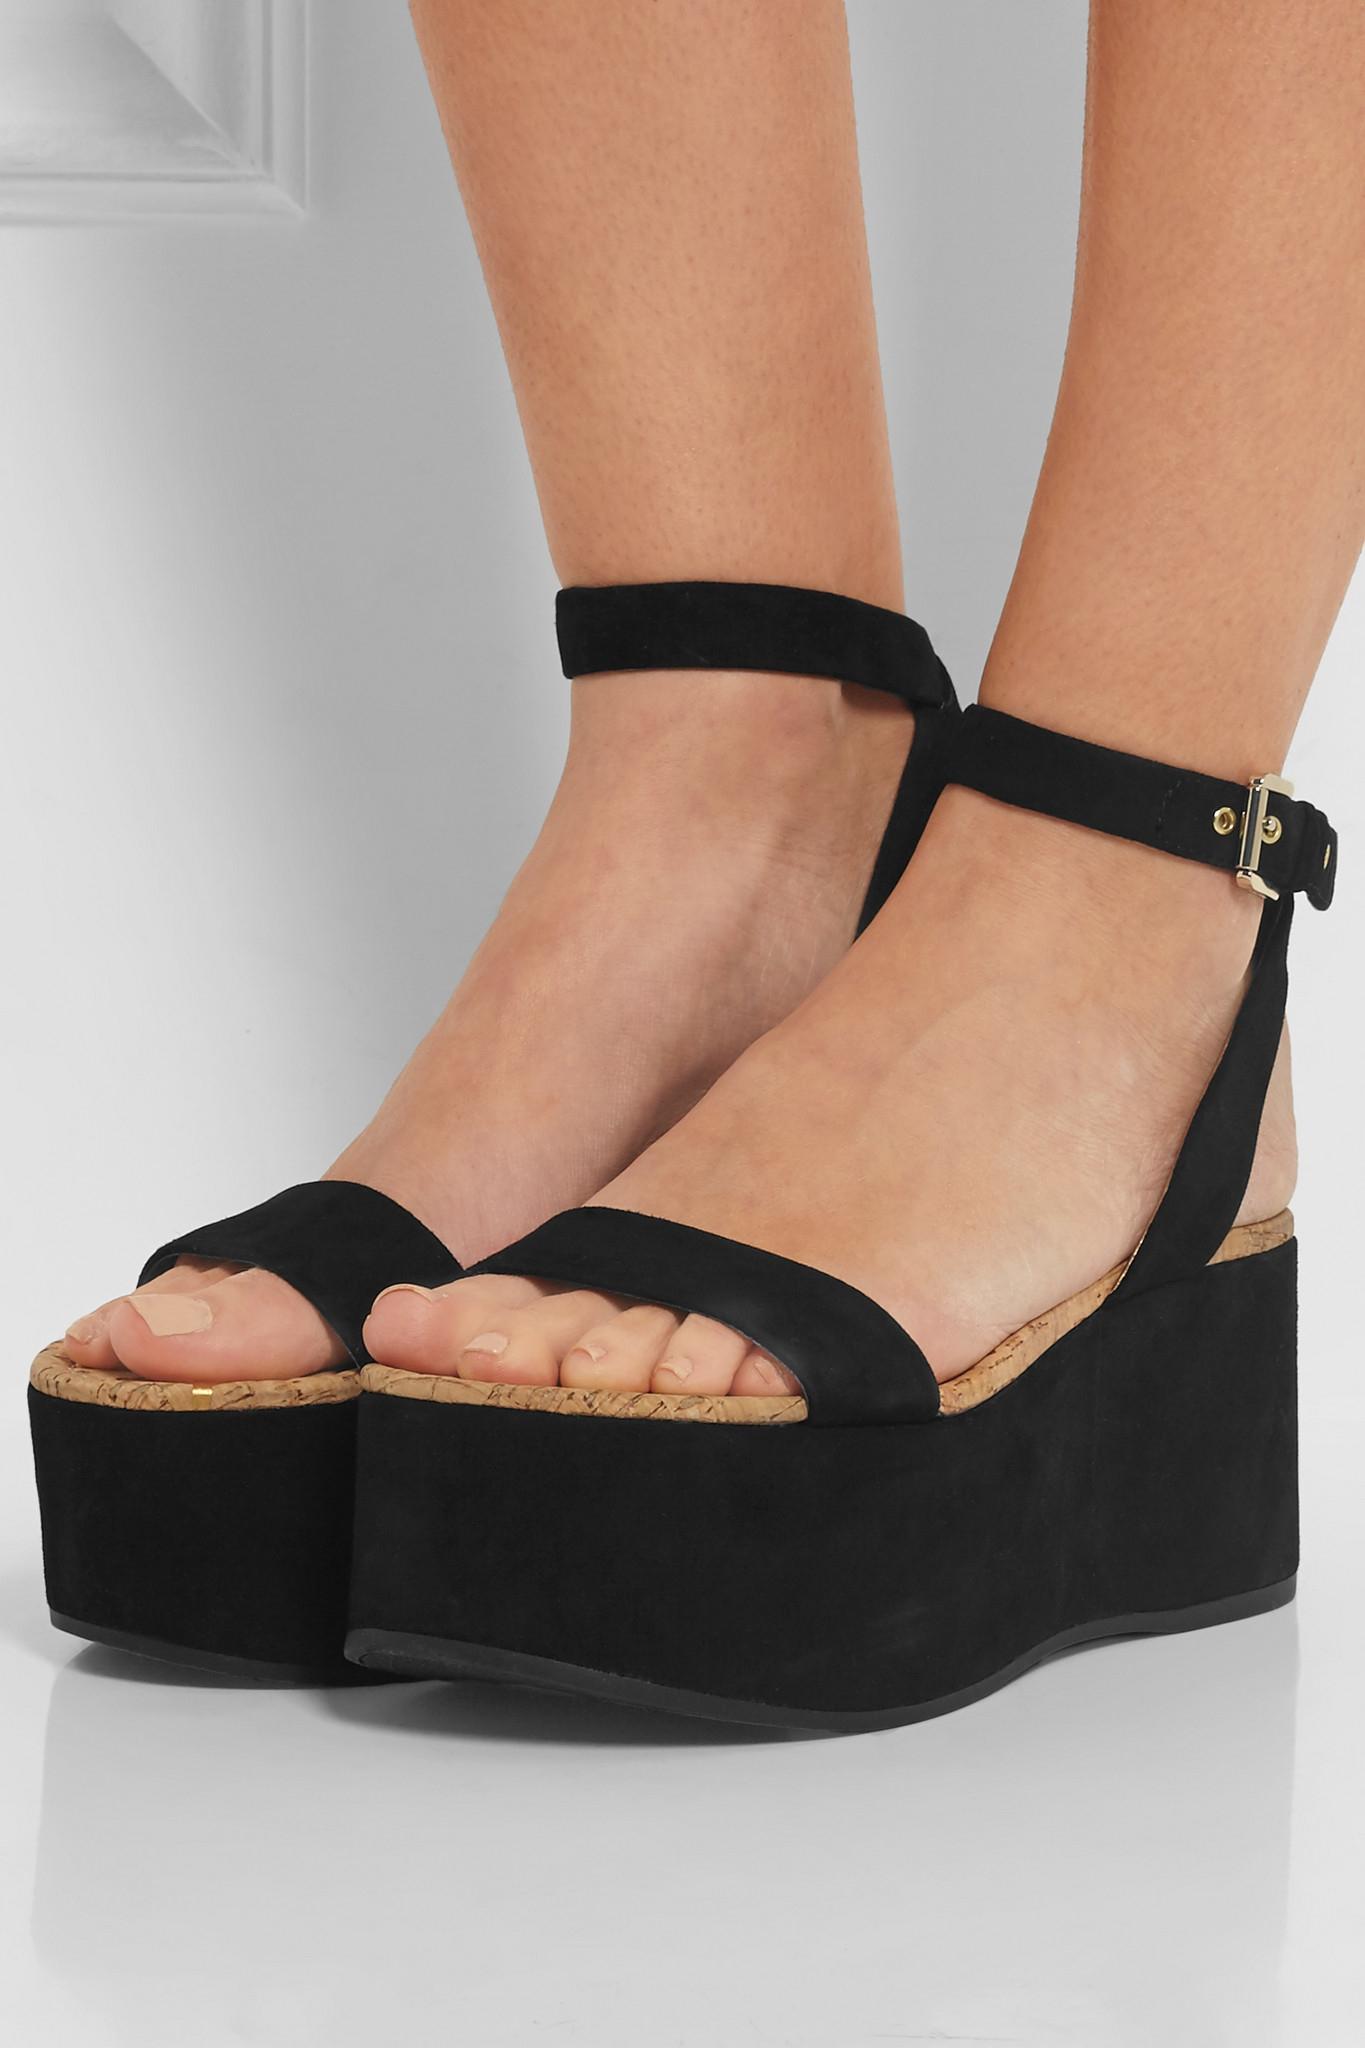 8ce68a77e810 Sam Edelman - Henley Suede Platform Sandals - Black in Black - Lyst